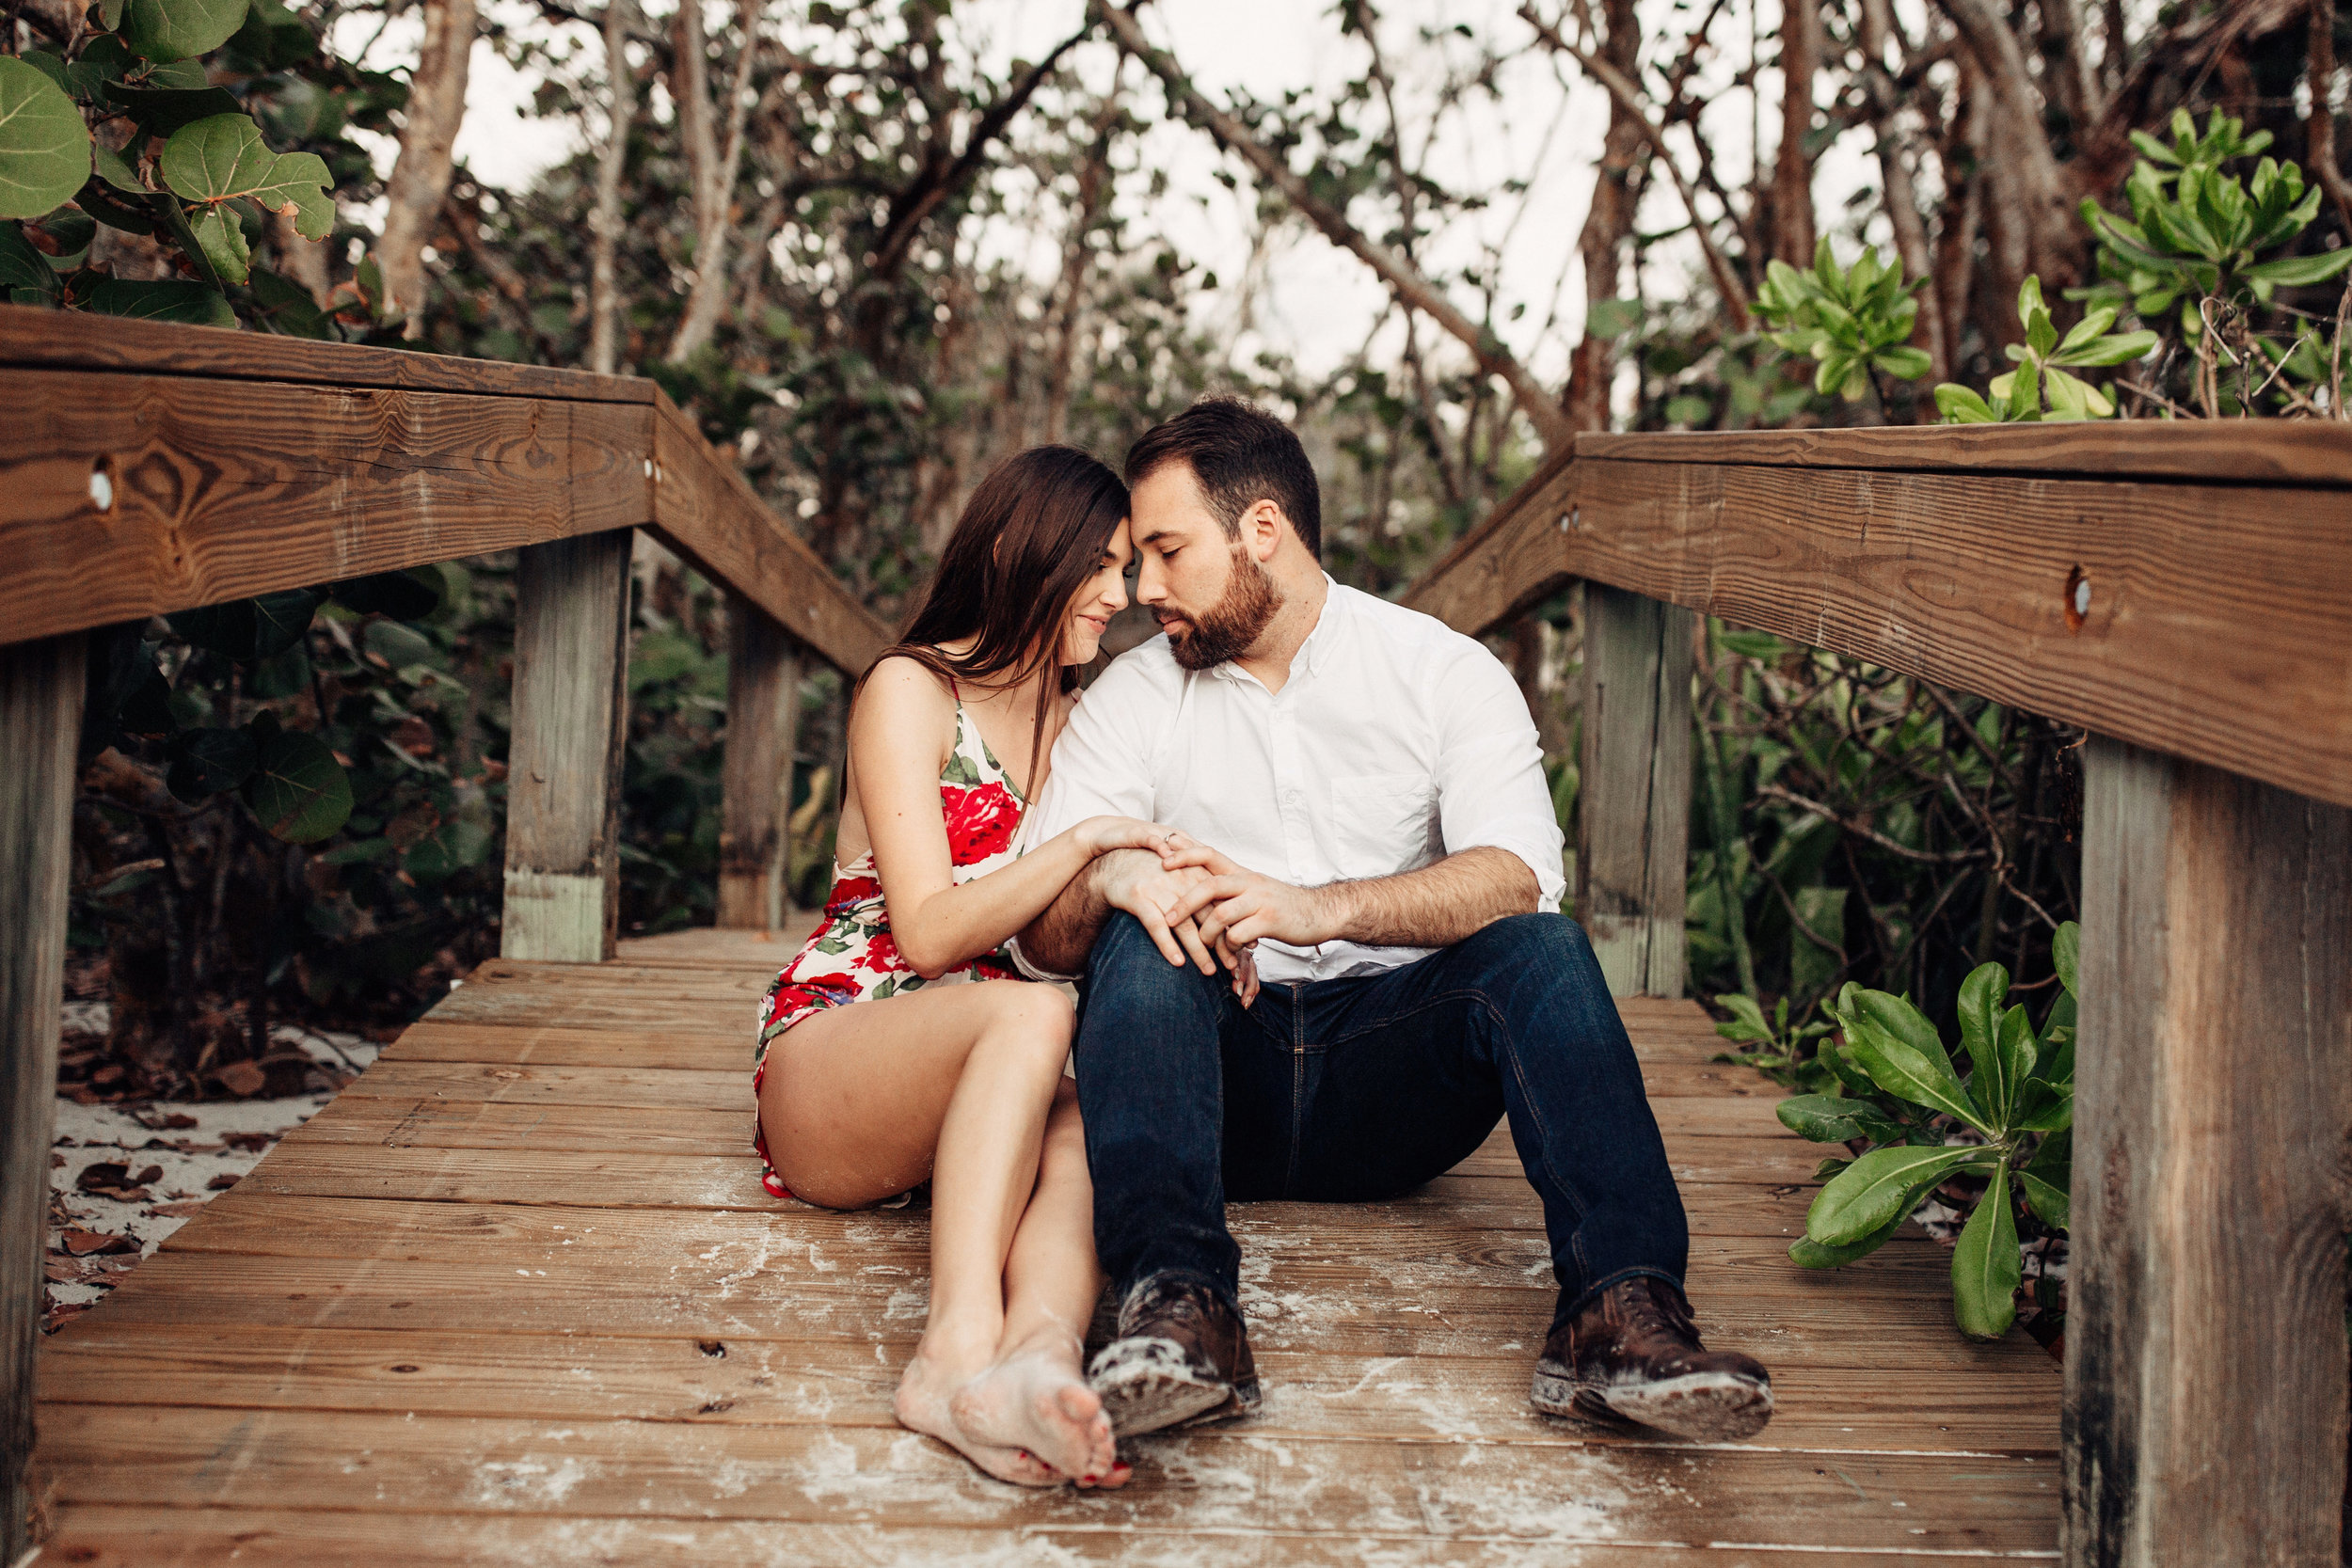 oahu-hawaii-wedding-photographer-147-finalA.JPG